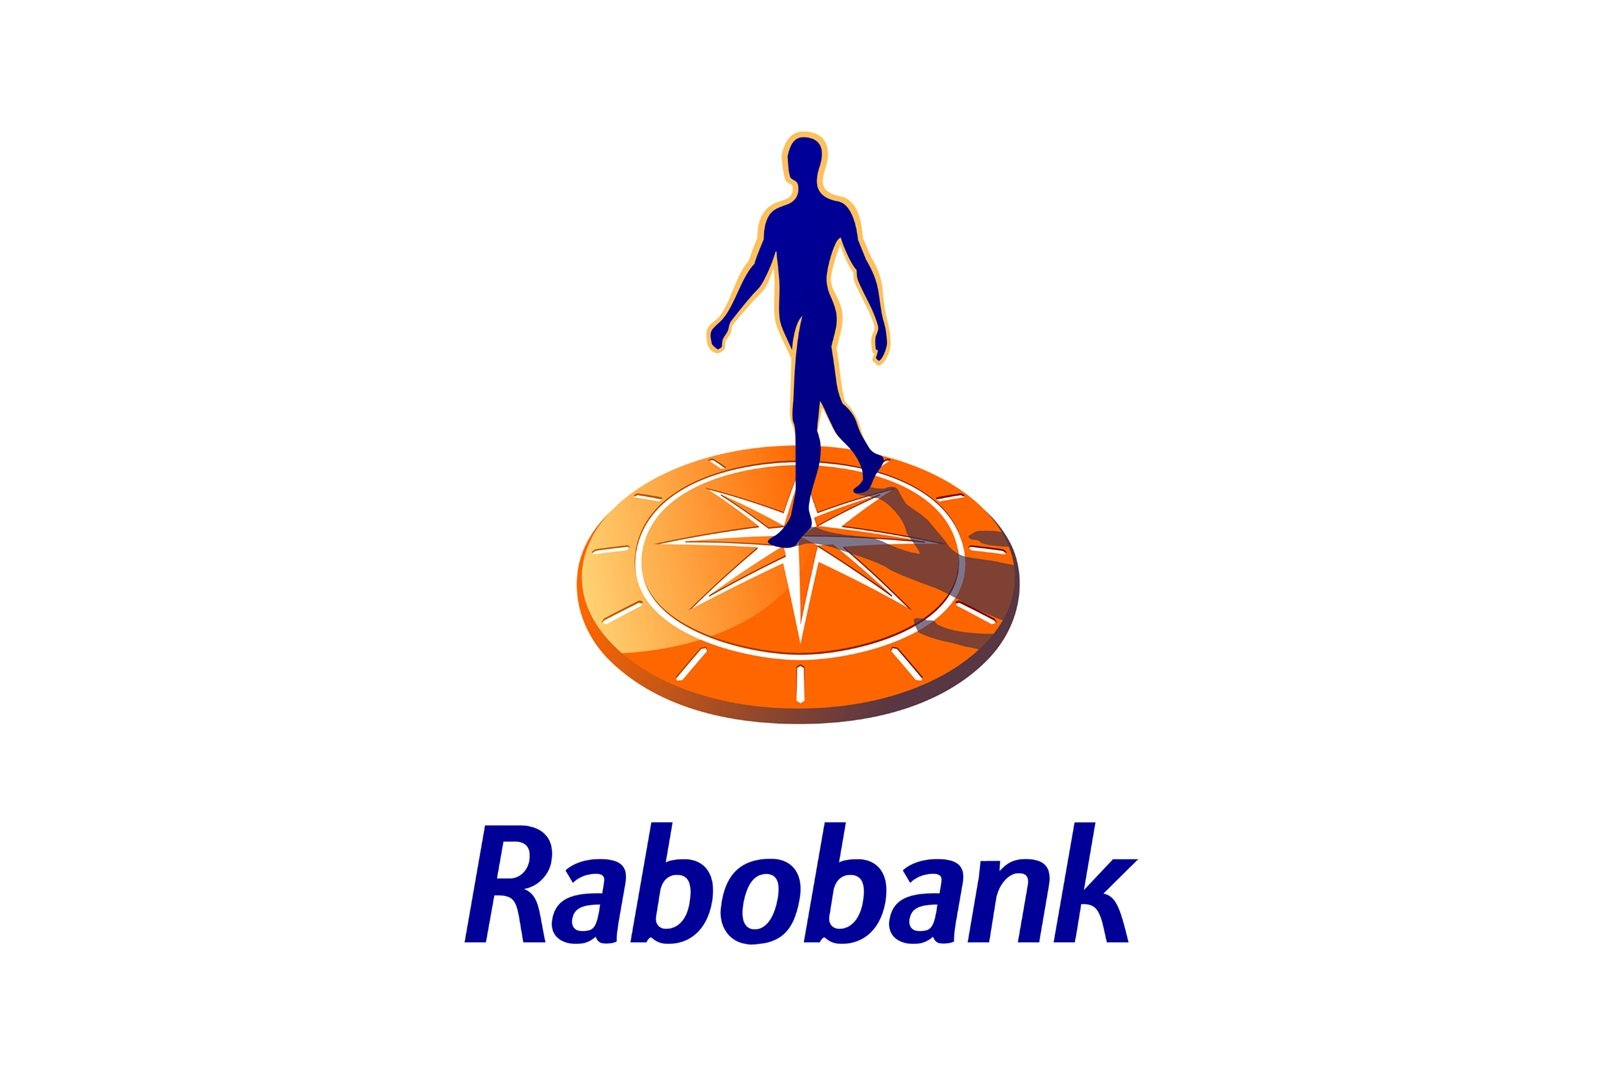 NEXTgarden--Rabobank-Oost-Betuwe_1600x1600